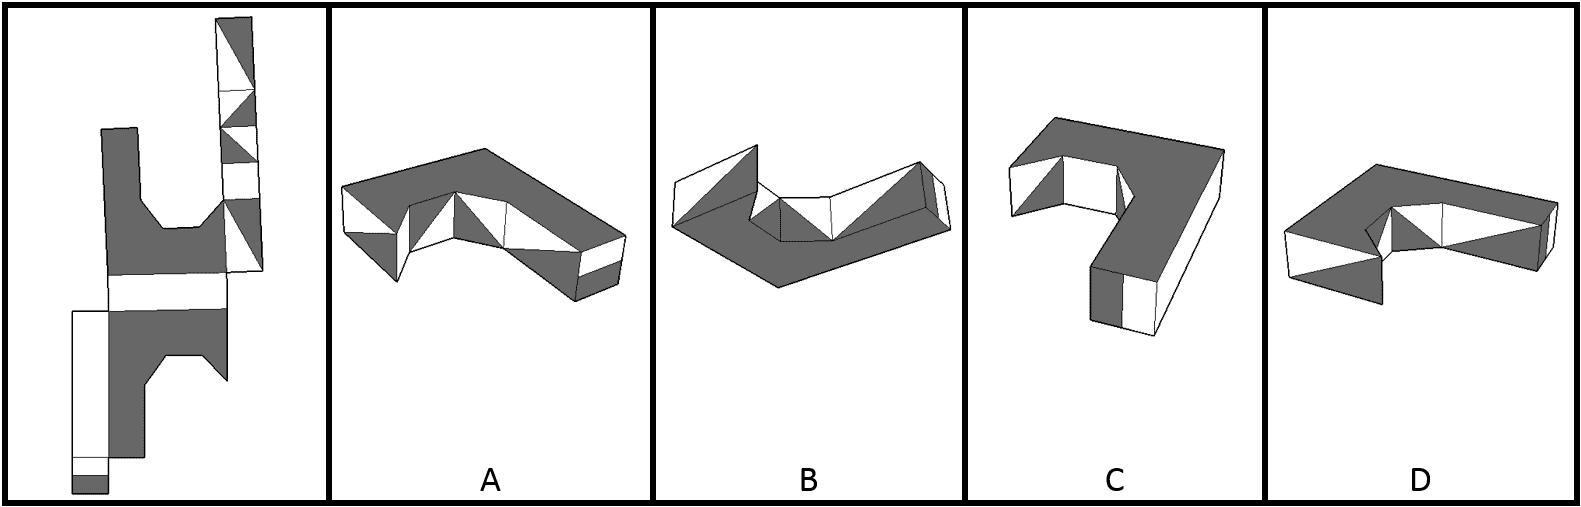 Pattern Folding13_post